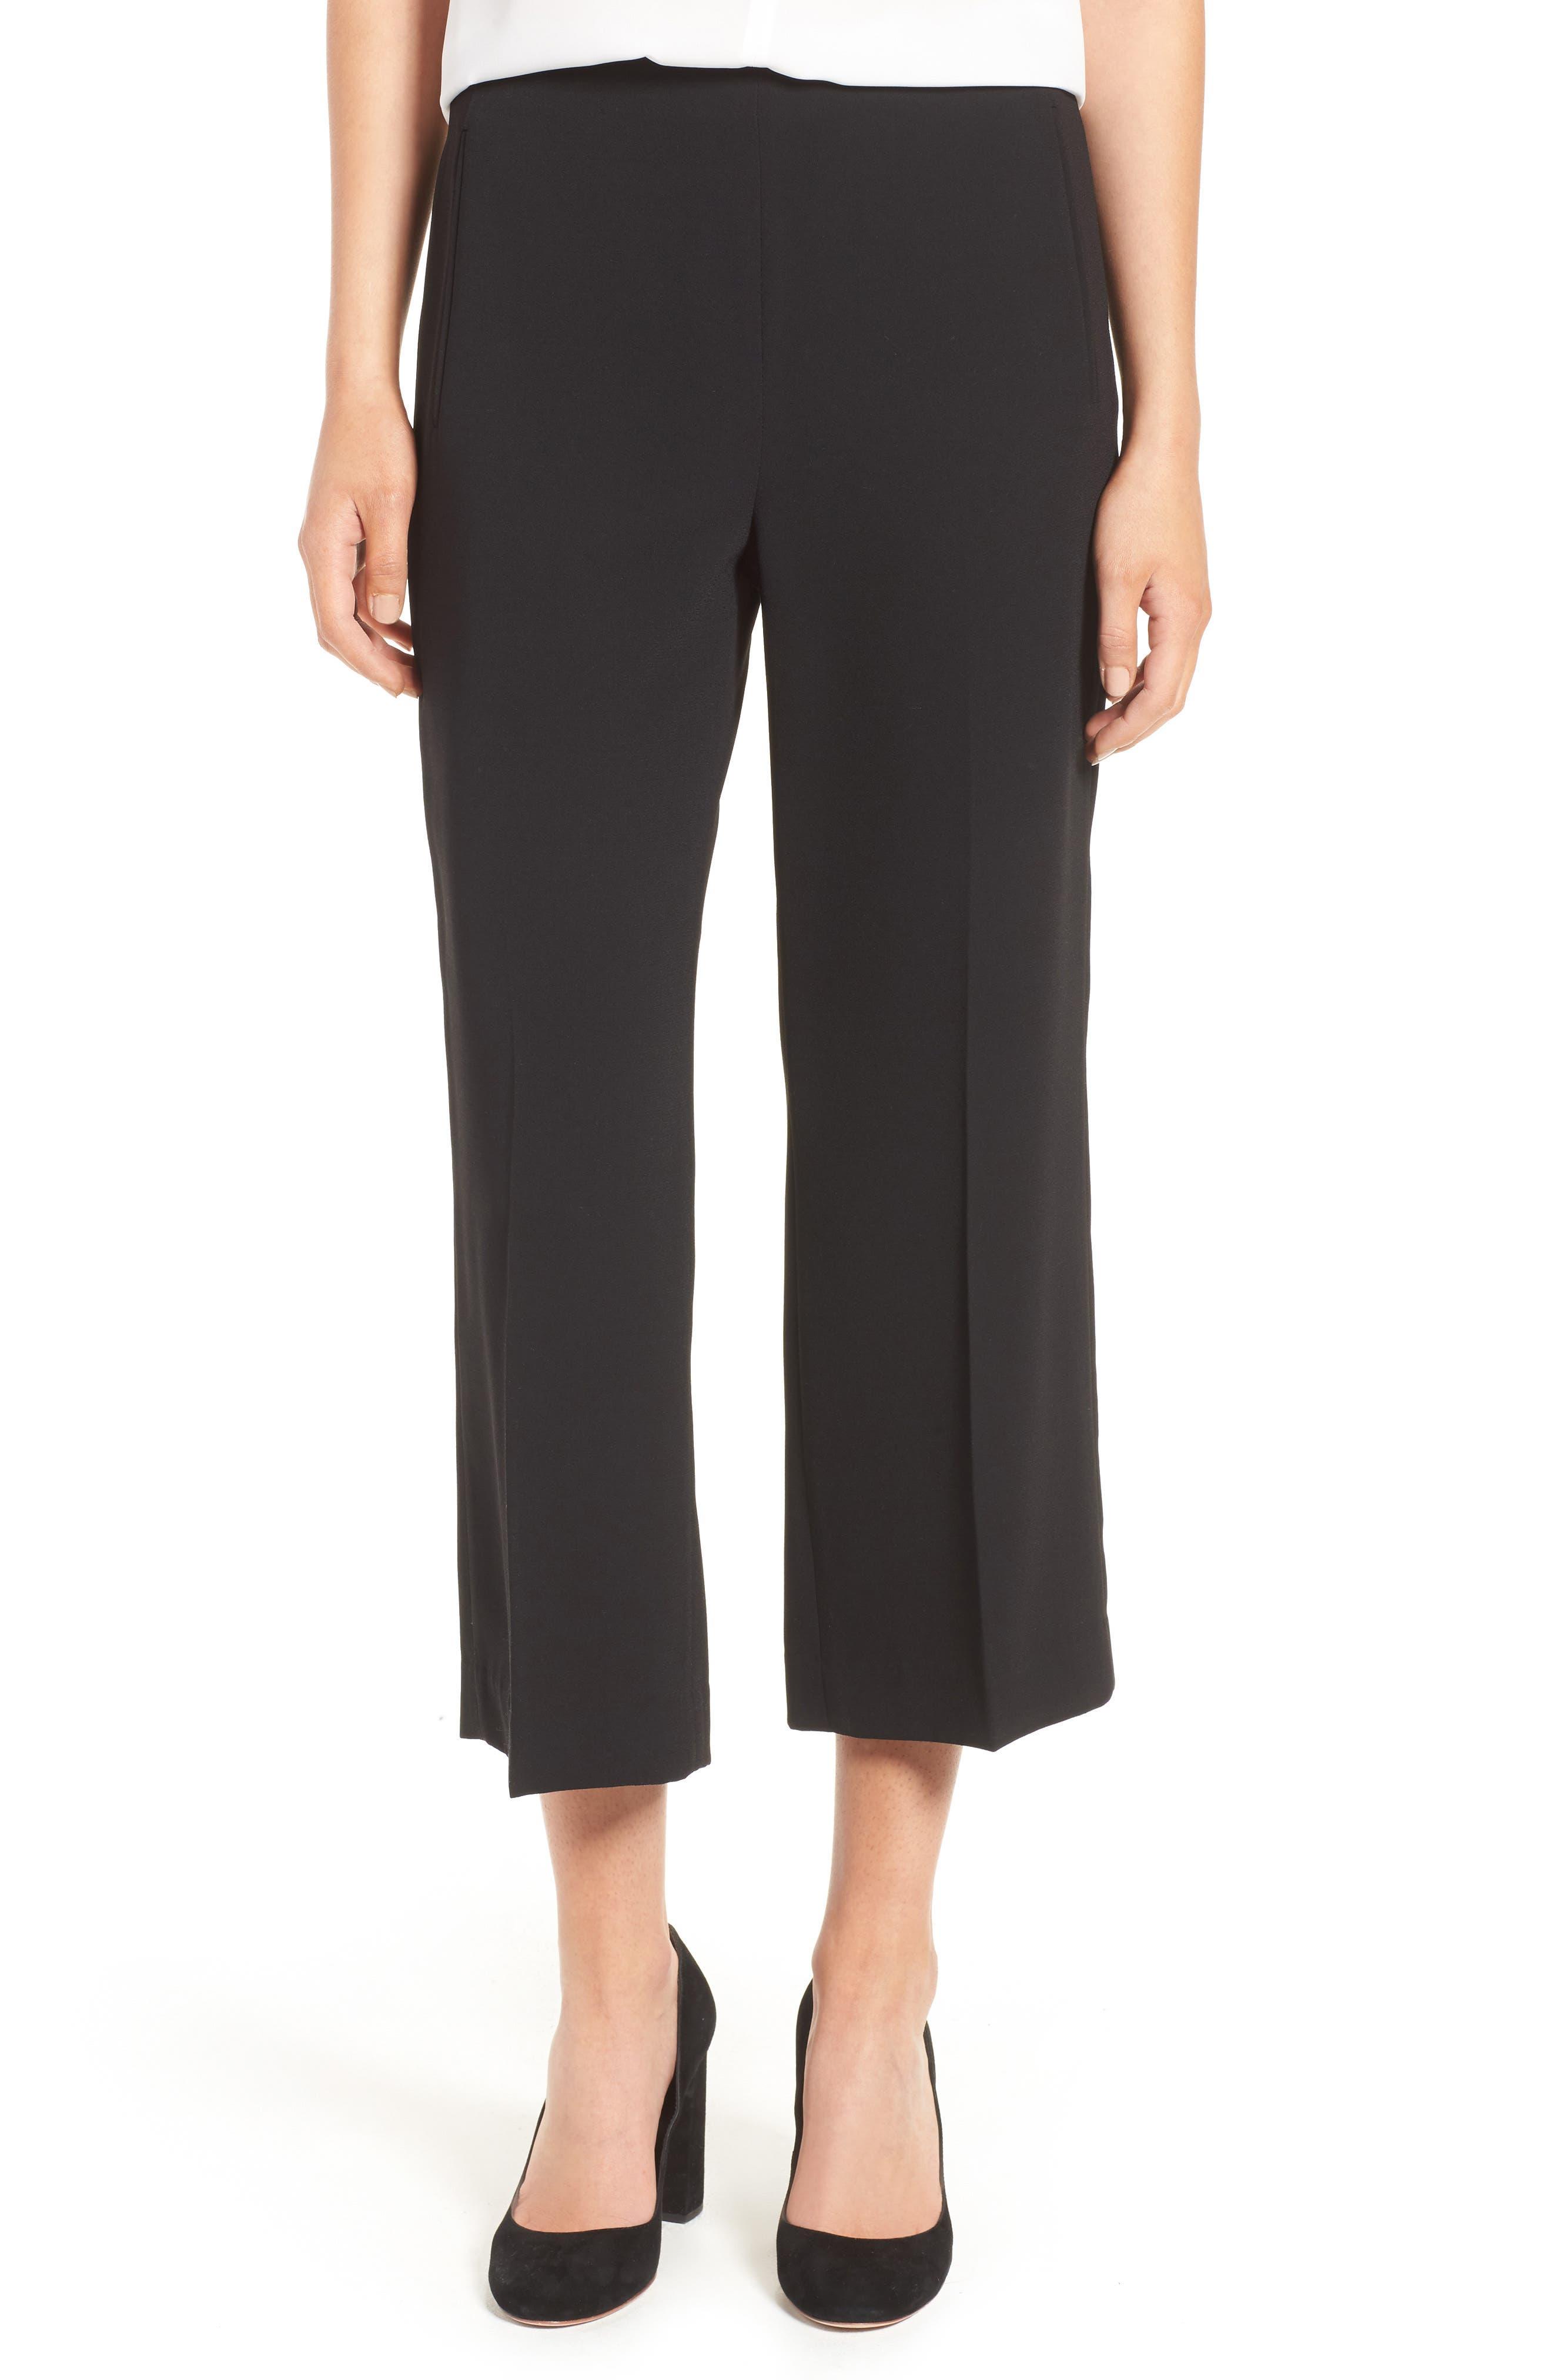 Moss Crepe Crop Trousers,                         Main,                         color, Black